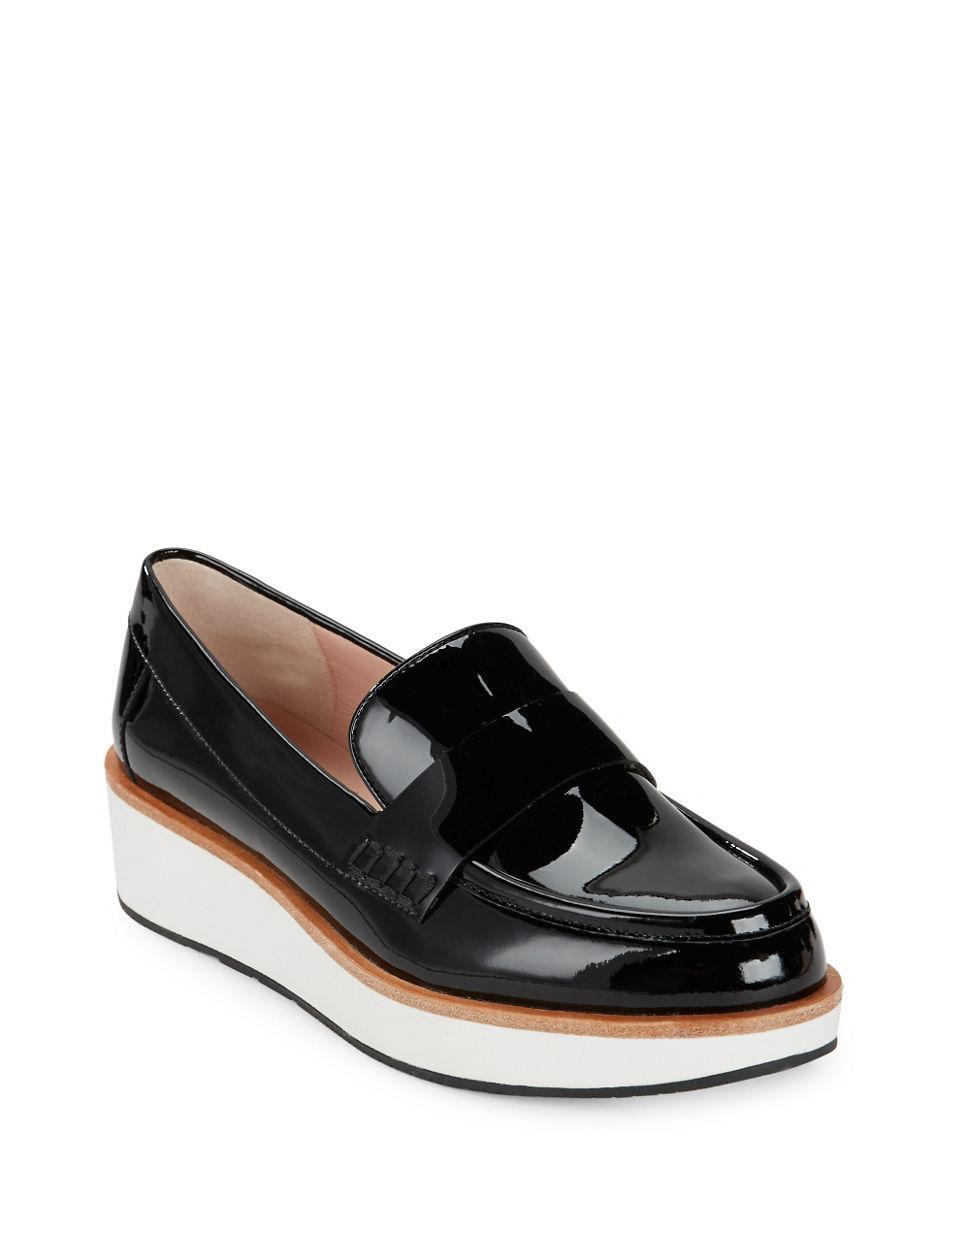 Jenny B Shoes New York